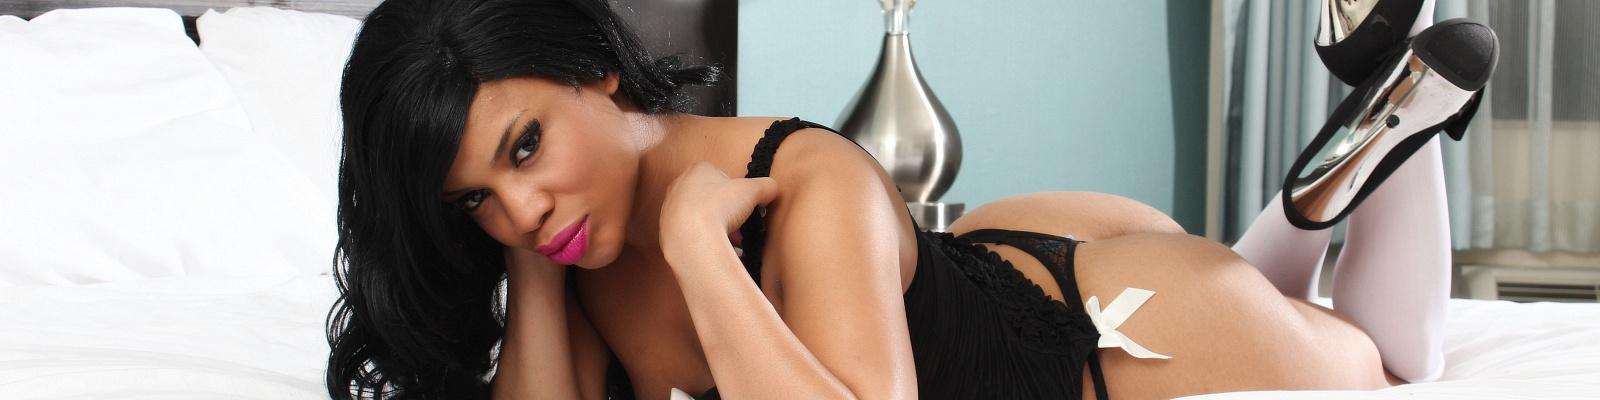 Layla Perez's Cover Photo